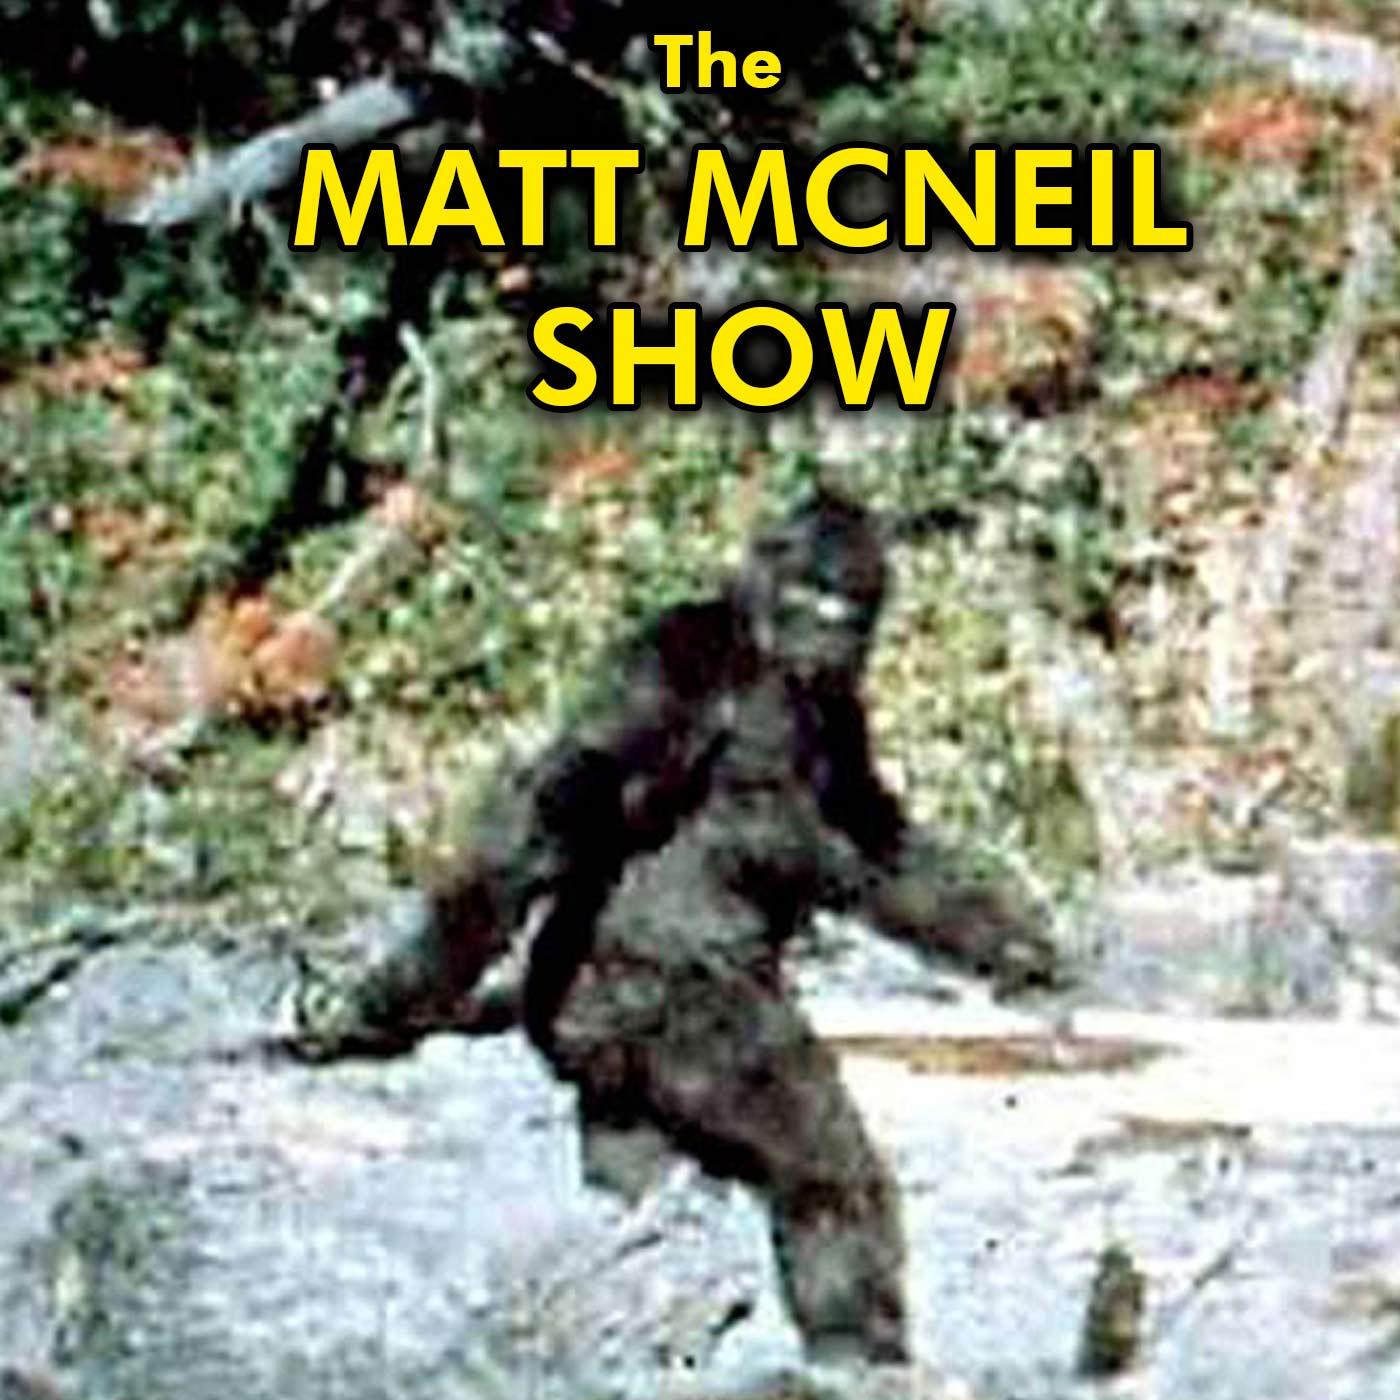 The Matt McNeil Show - AM950 The Progressive Voice of Minnesota